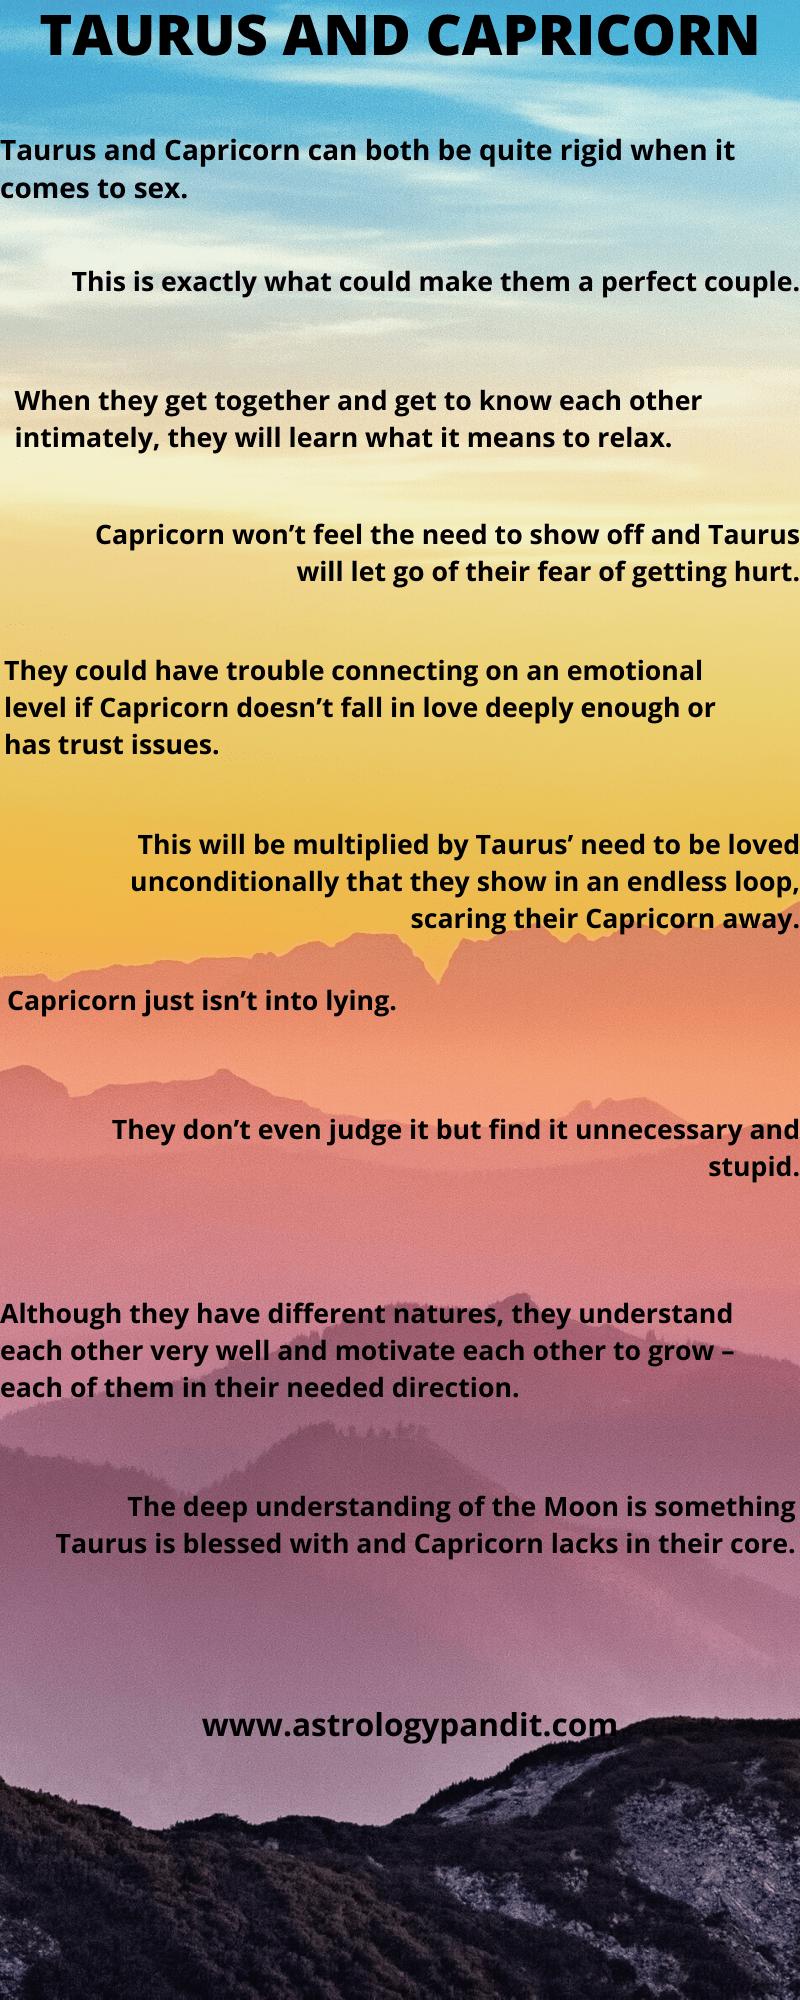 Taurus Man Capricorn Woman Compatibility In Love Online The Love Relationship Between Taurus L In 2020 Taurus Man Capricorn Woman Capricorn And Taurus Capricorn Women